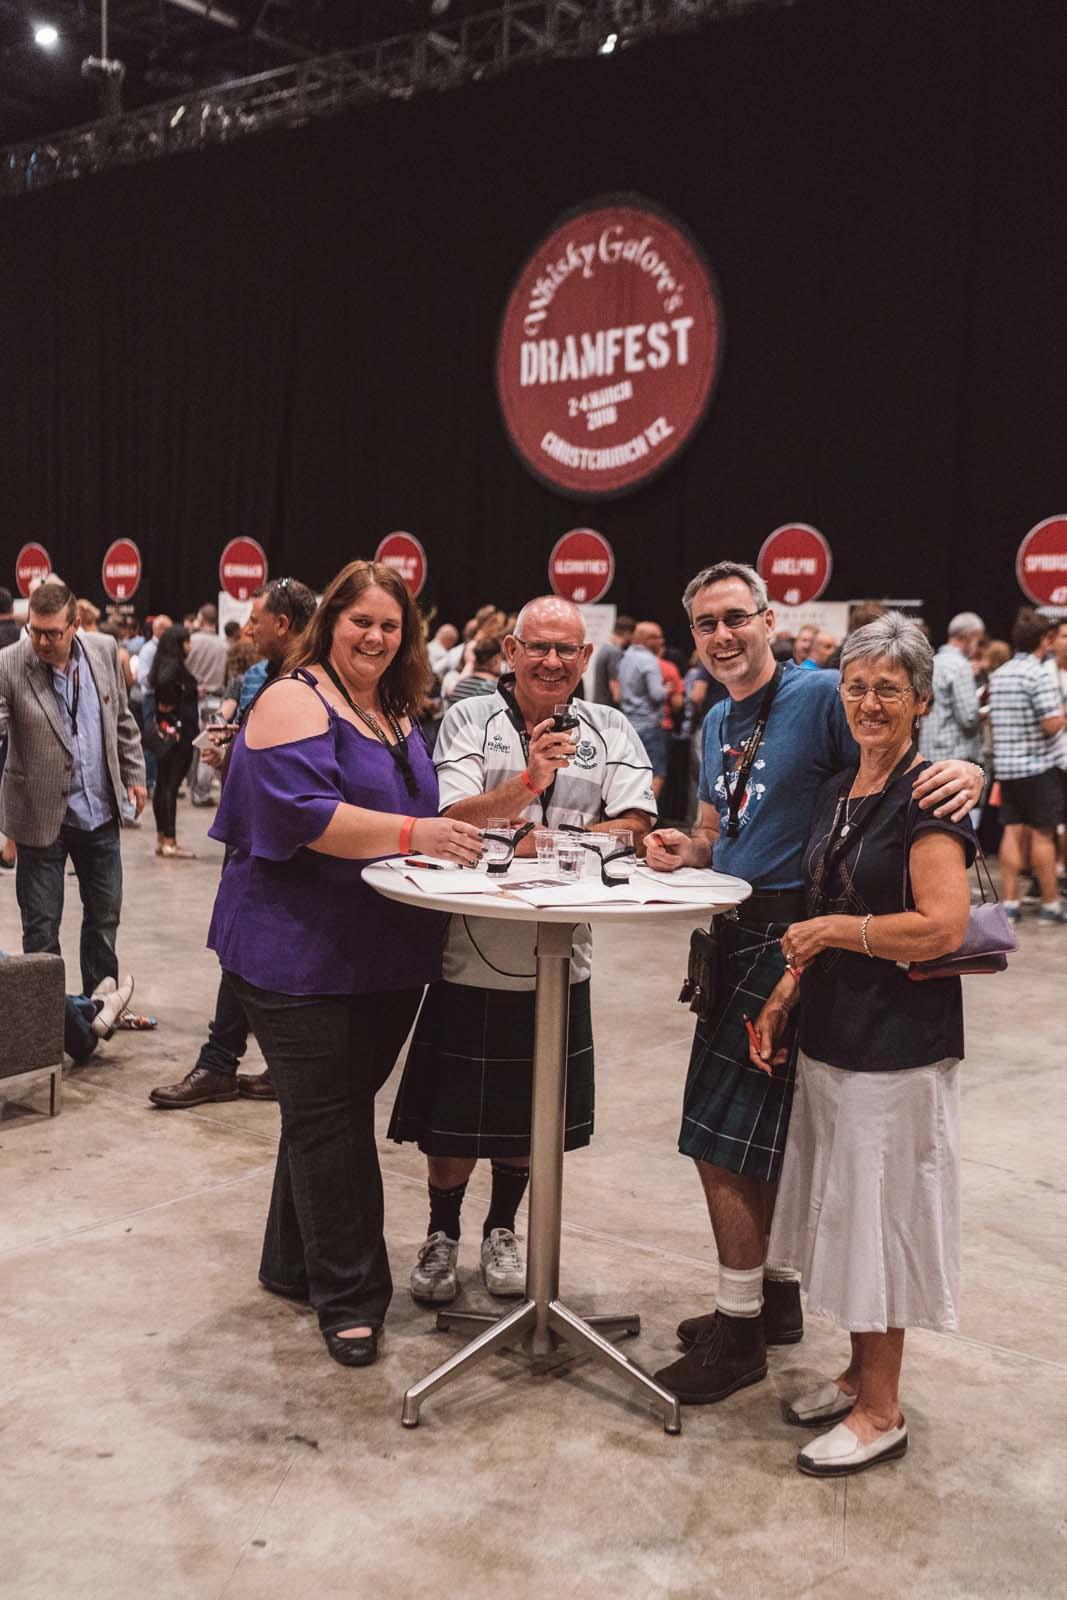 Dramfest 2018 for Whisky Galore-344.jpg